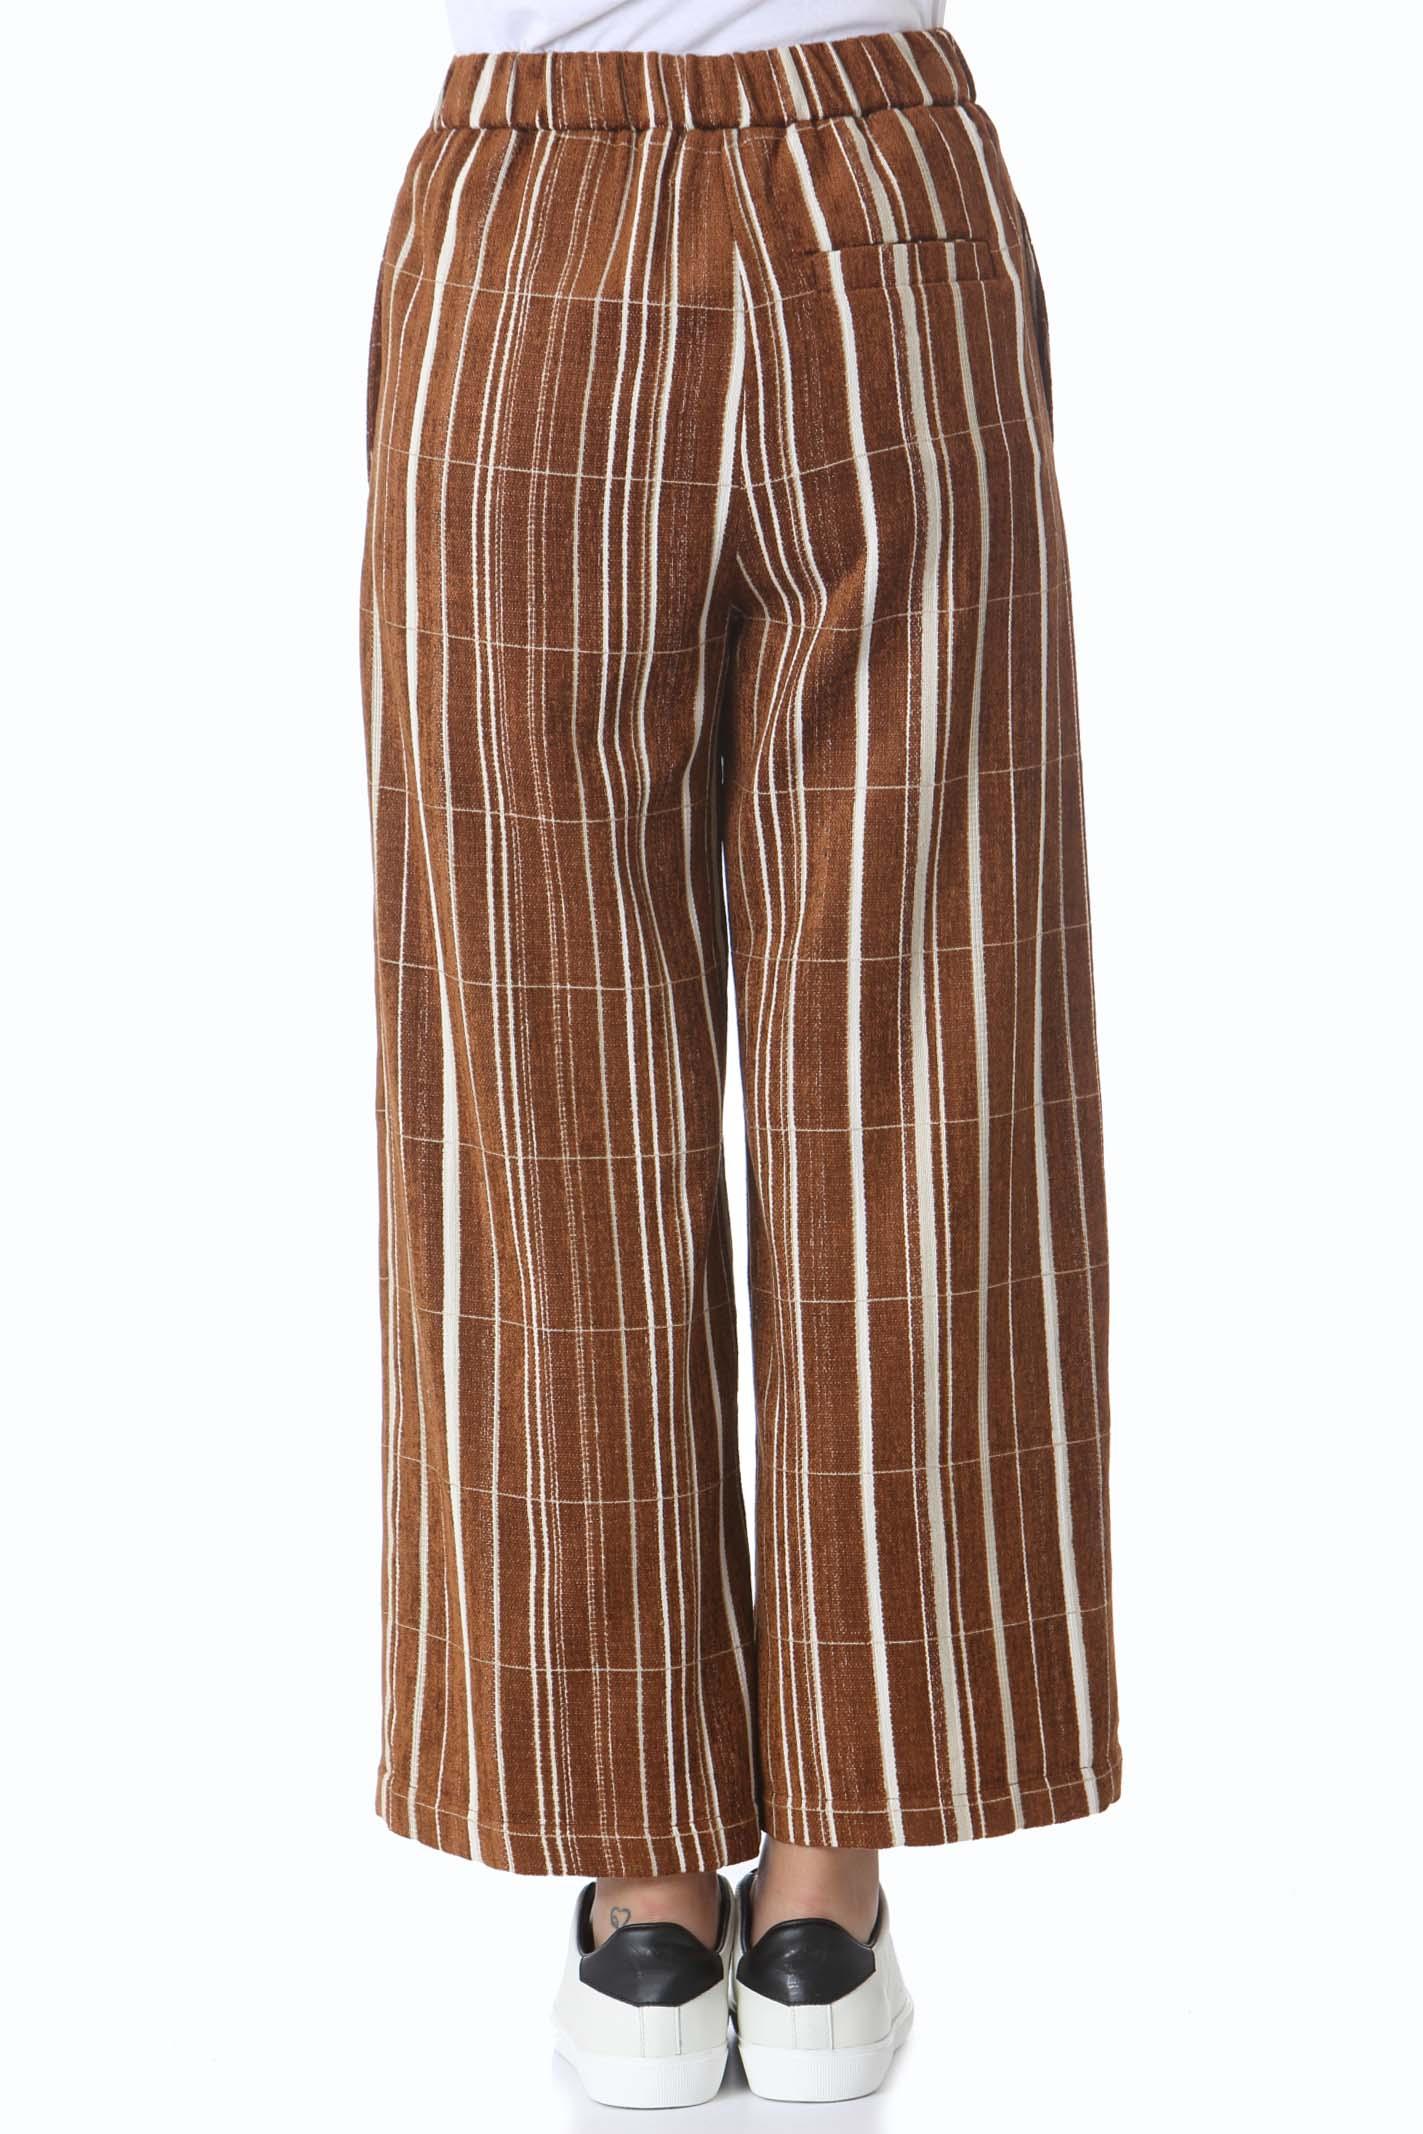 Pantalone donna stripes velvet ALYSI | Pantaloni | 151124-A1003CAR